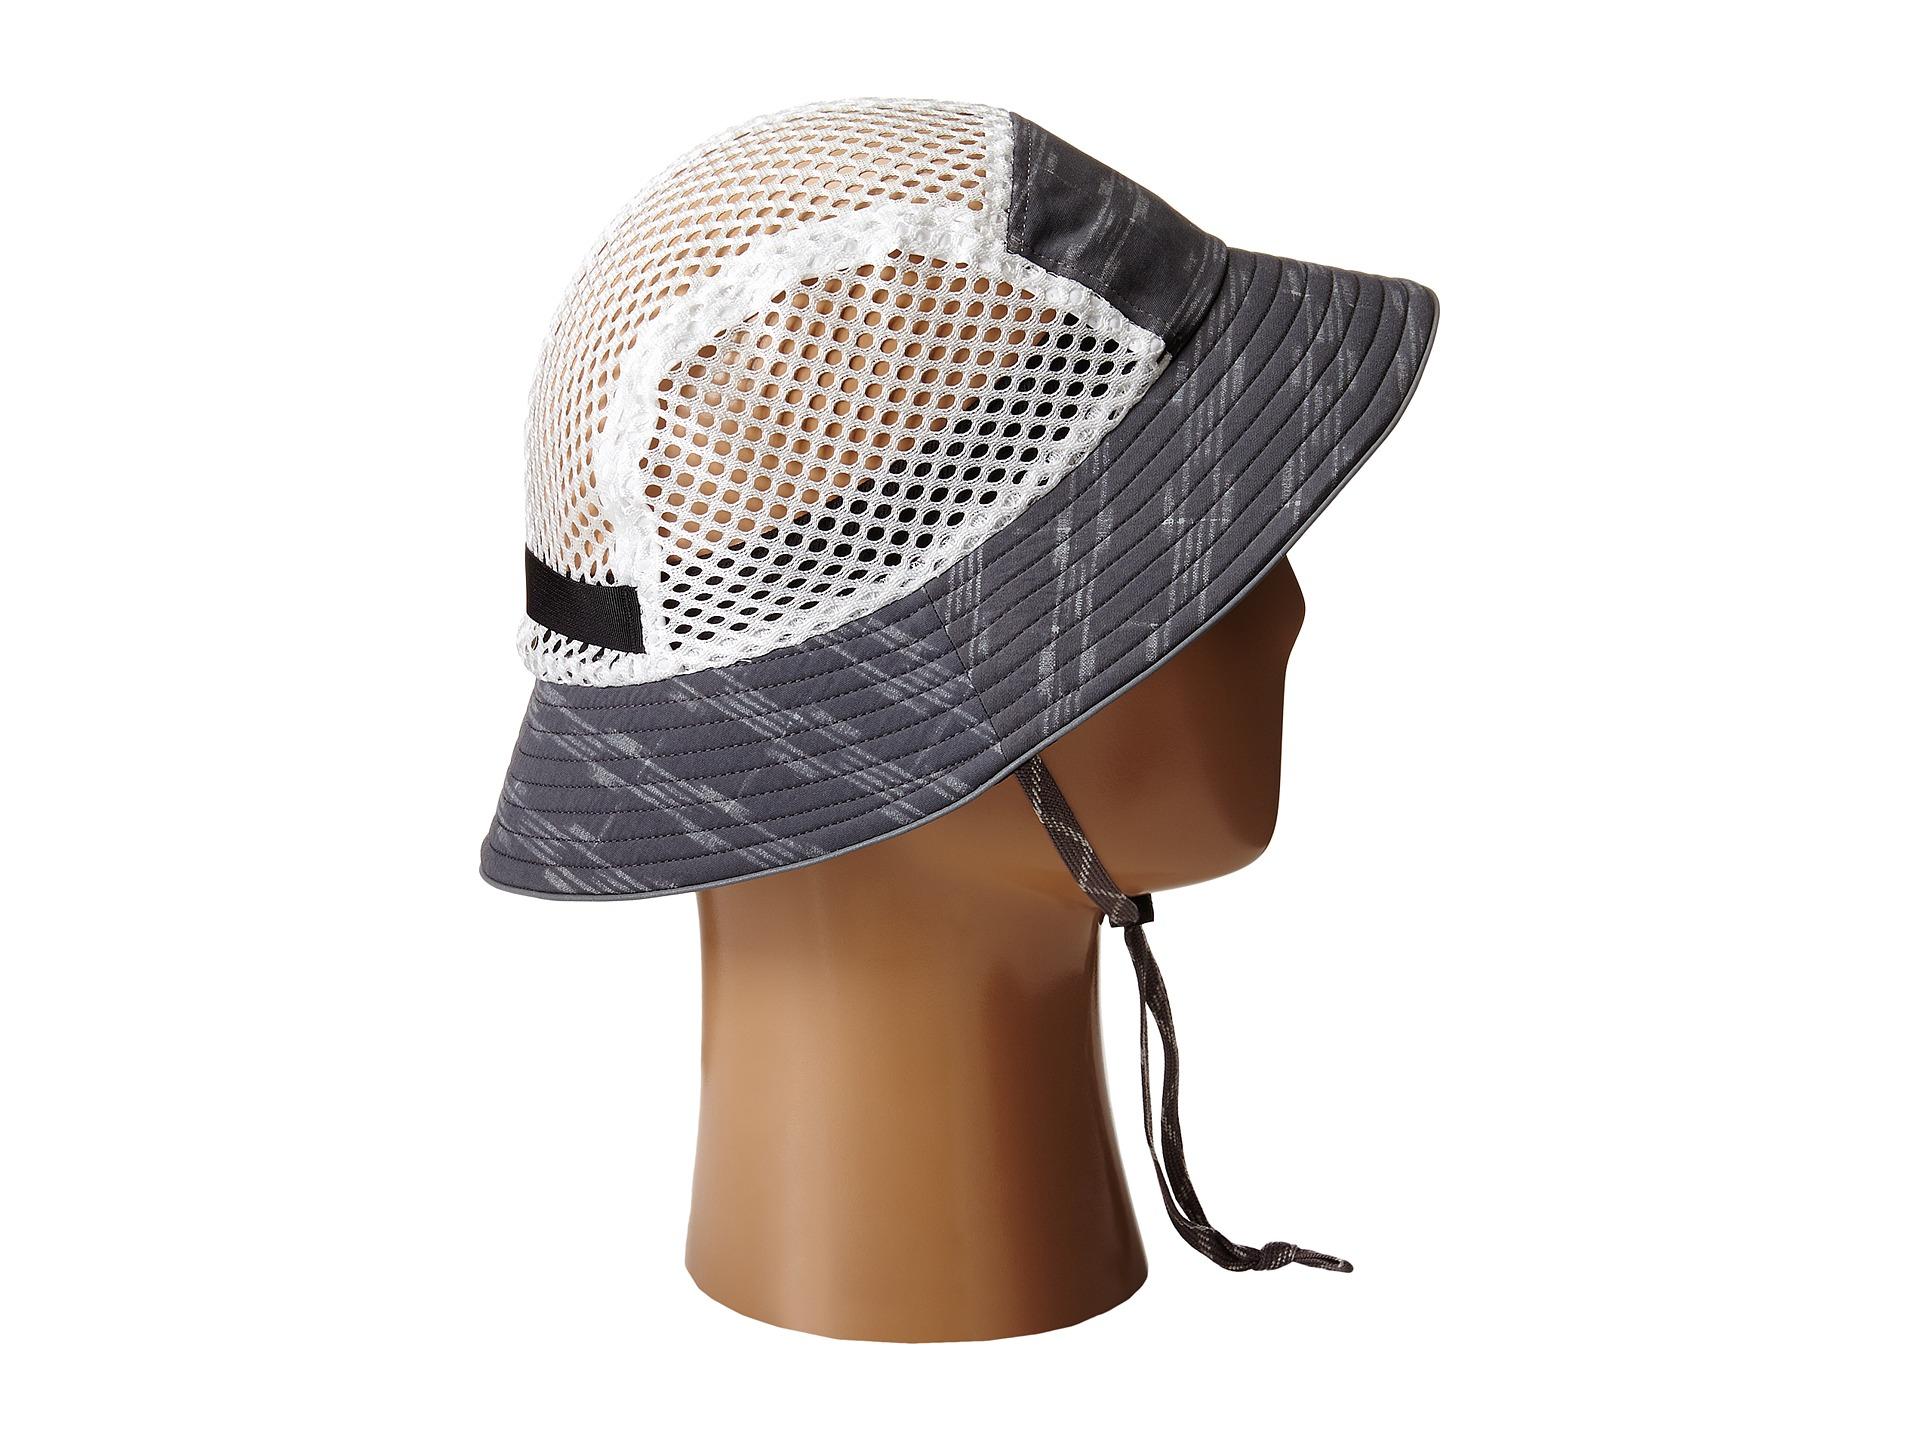 Lyst - Patagonia Duckbill Bucket Hat in Gray 0f0e4482500